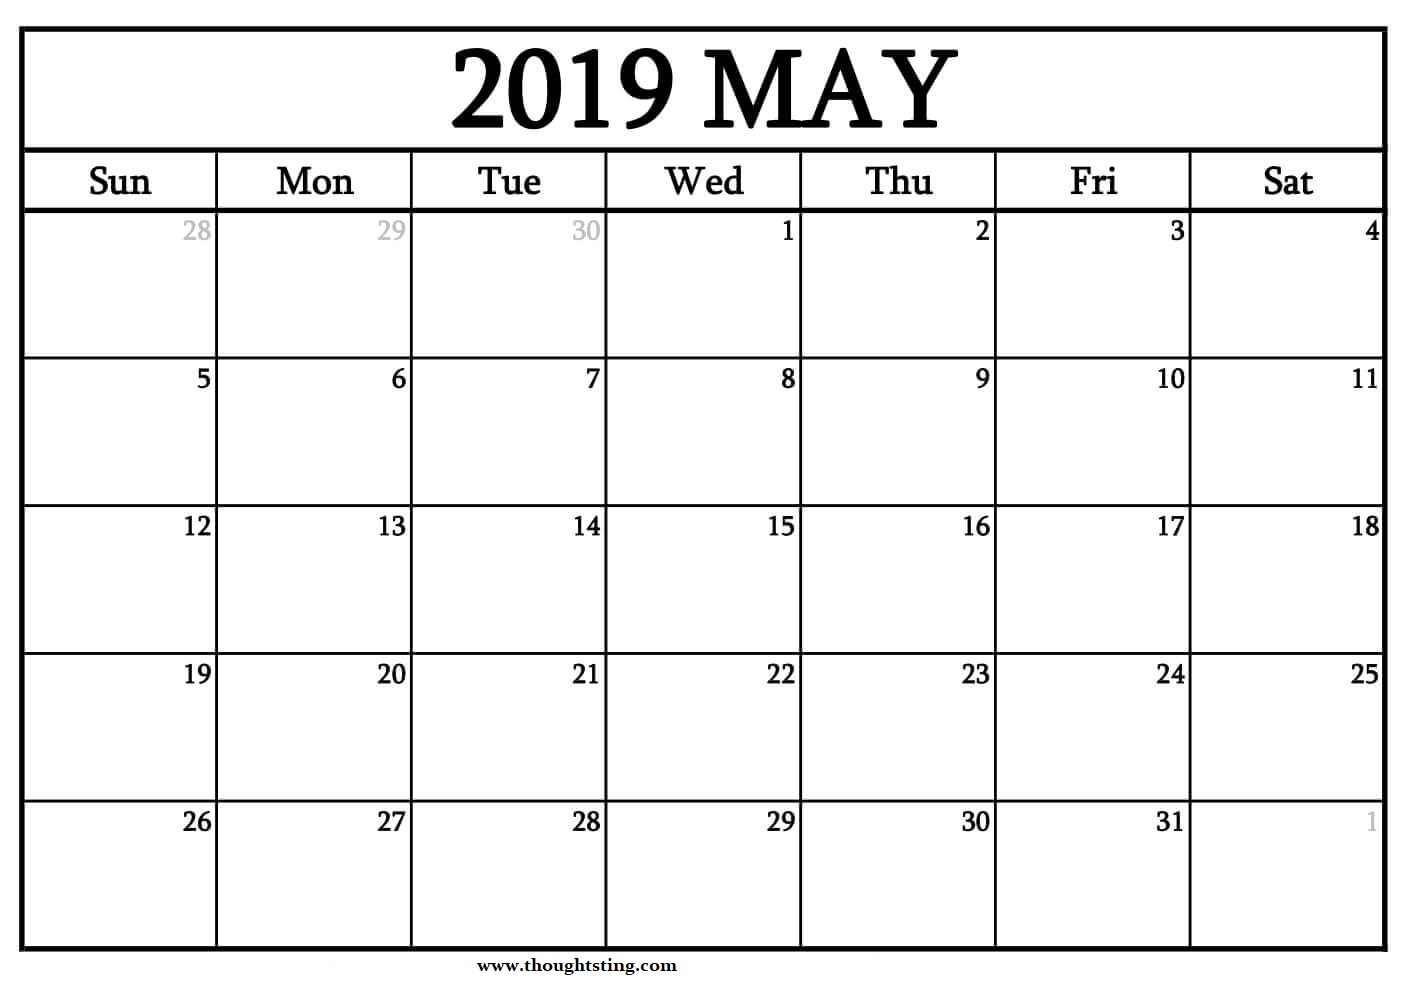 Free Printable May 2019 Calendar Template Word And Excel - Free within Word Calendar Template Excel